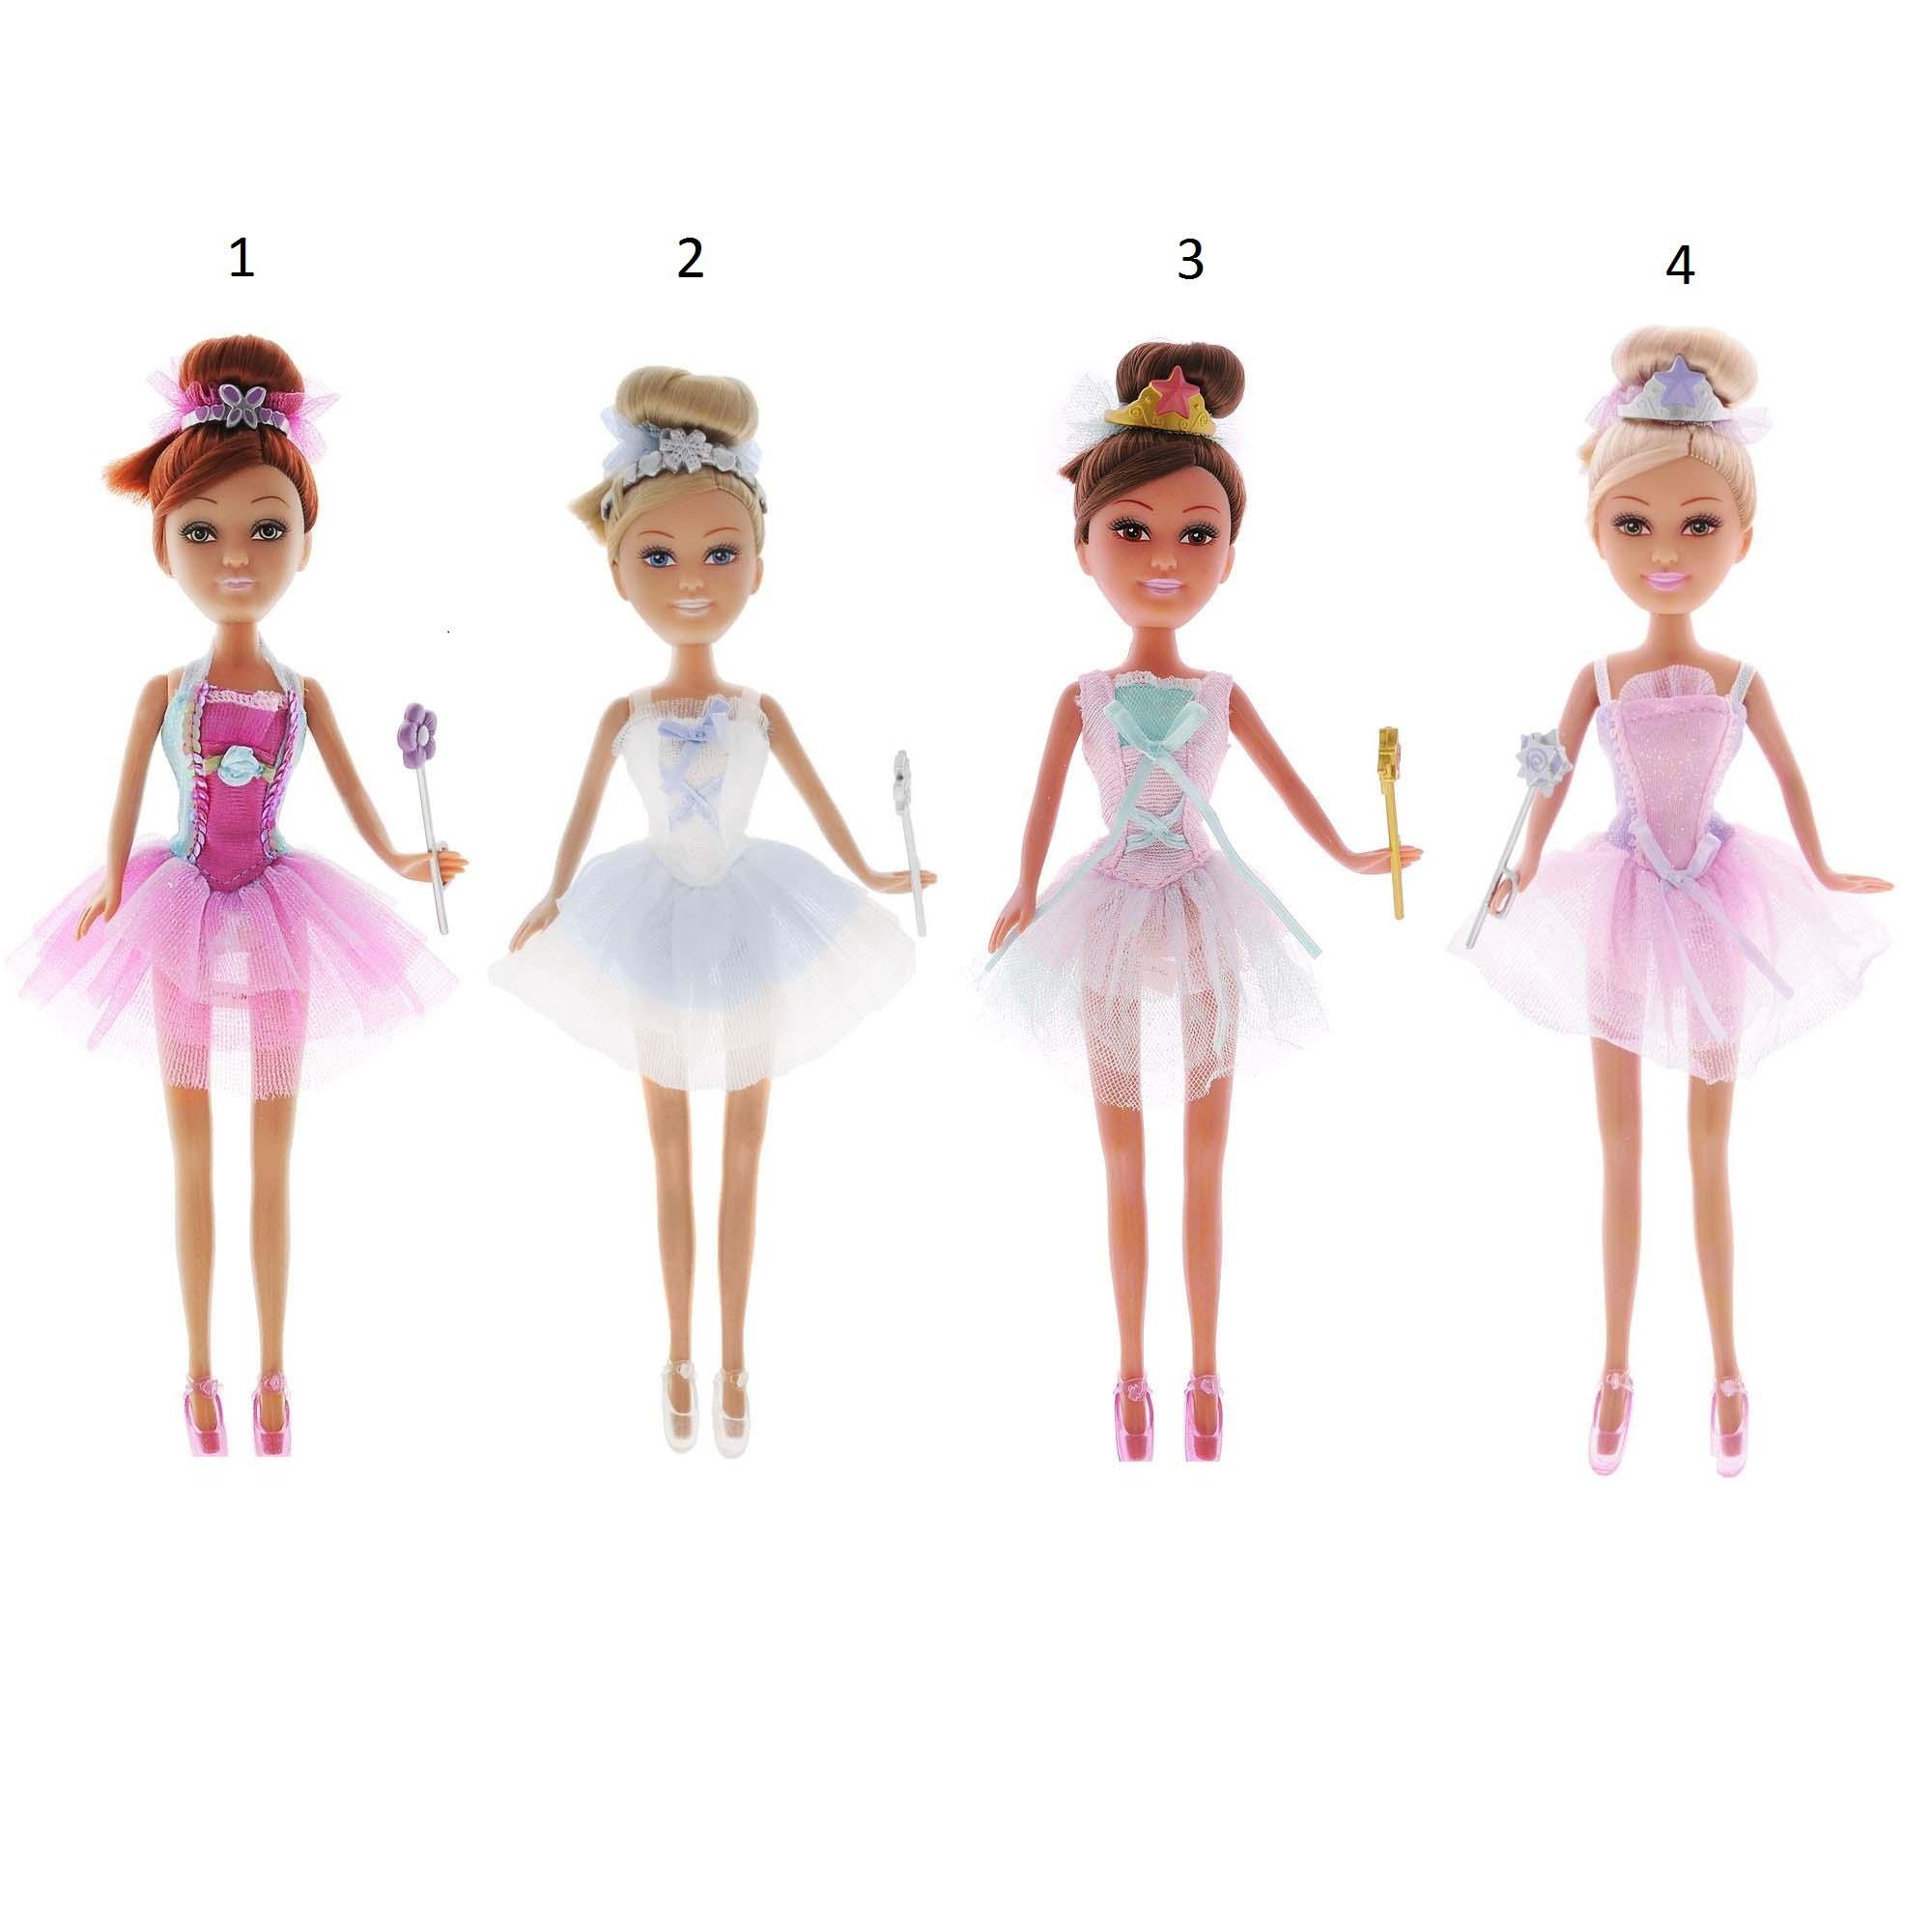 Кукла - БалеринаПупсы<br>Кукла - Балерина<br>